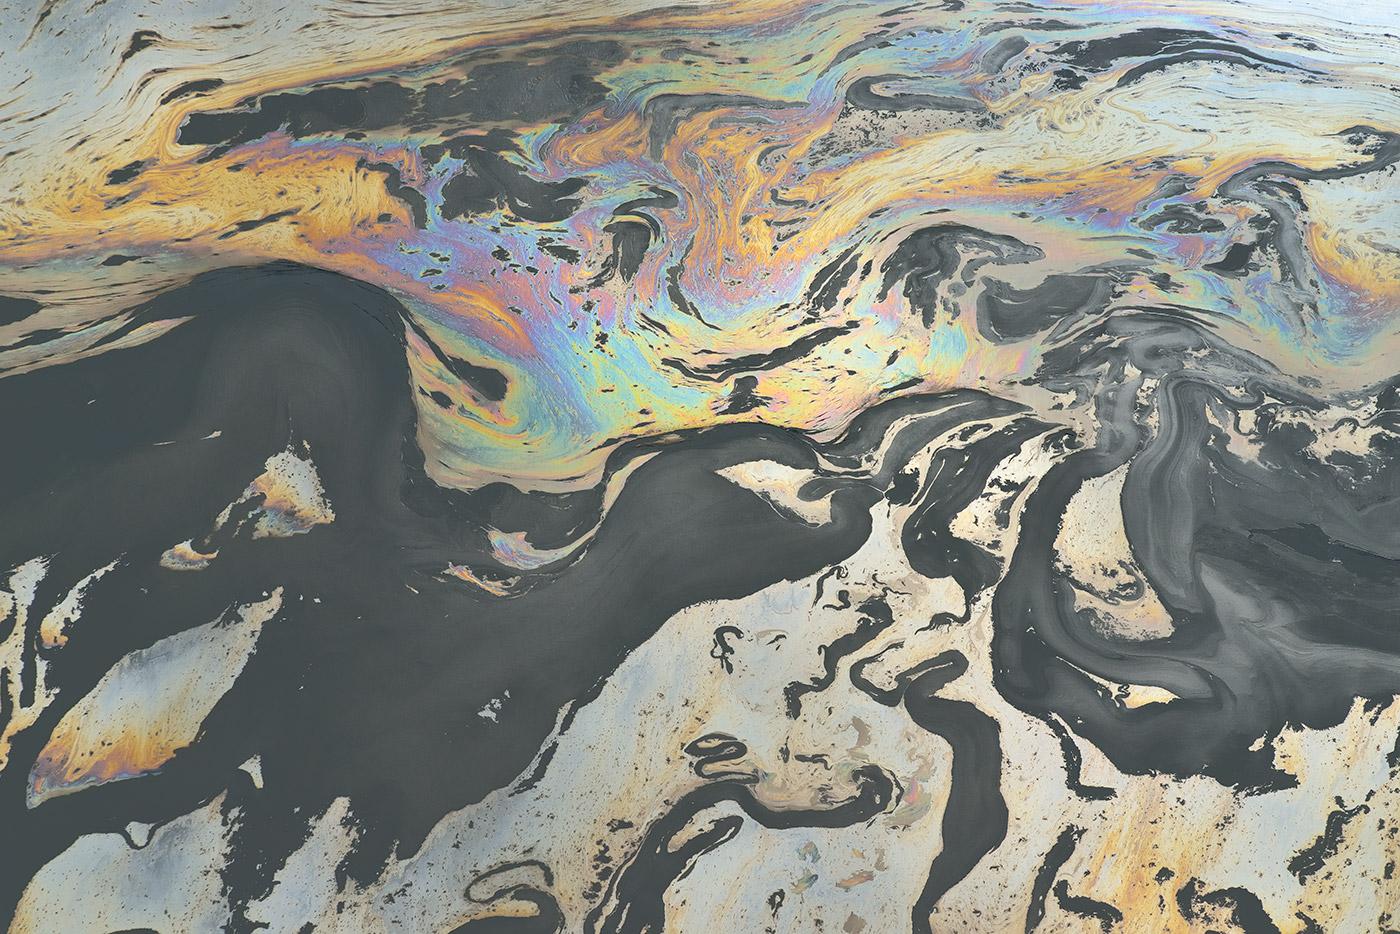 Rainbow-Lava-G1741107-Louis-Helbig-Alberta-Oil-Tar-Sands.jpg.1